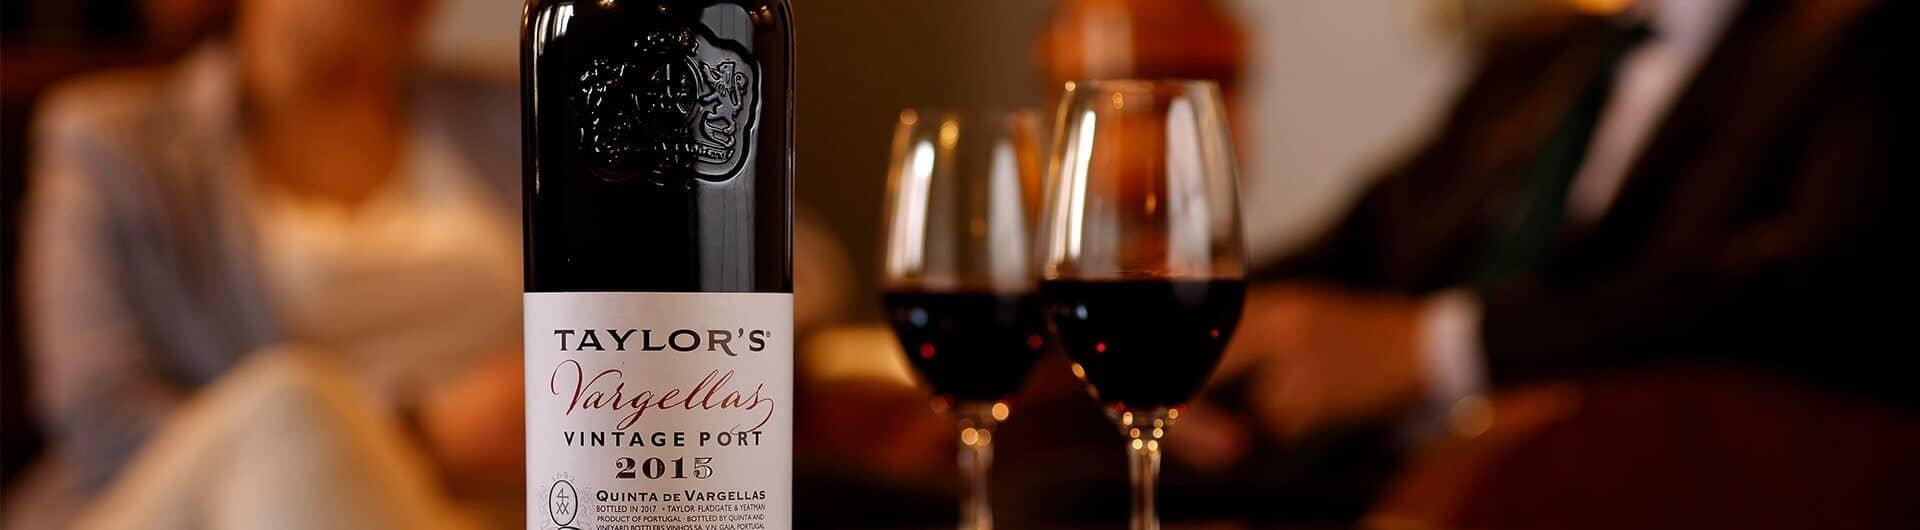 Quinta de Vargellas Vintage 2015 Port wine bottle